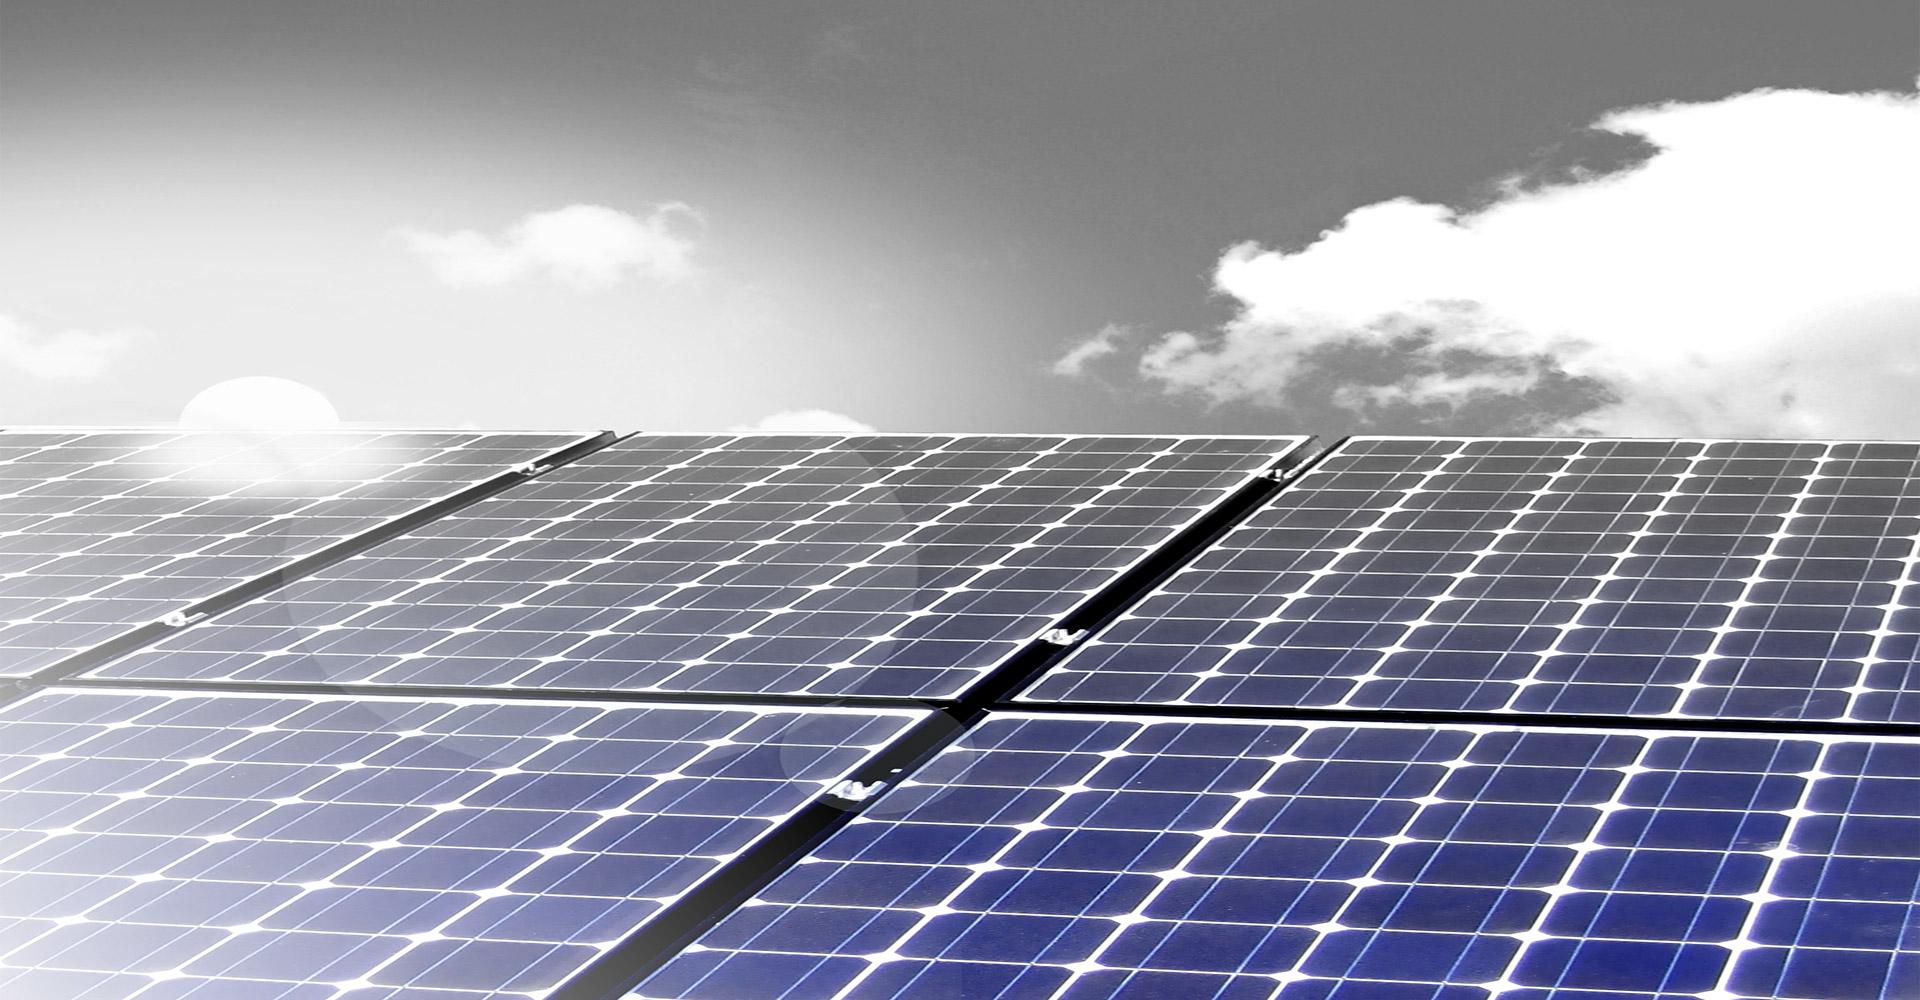 RECUPERARE ENERGIA TRAMITE LA LUCE SOLARE